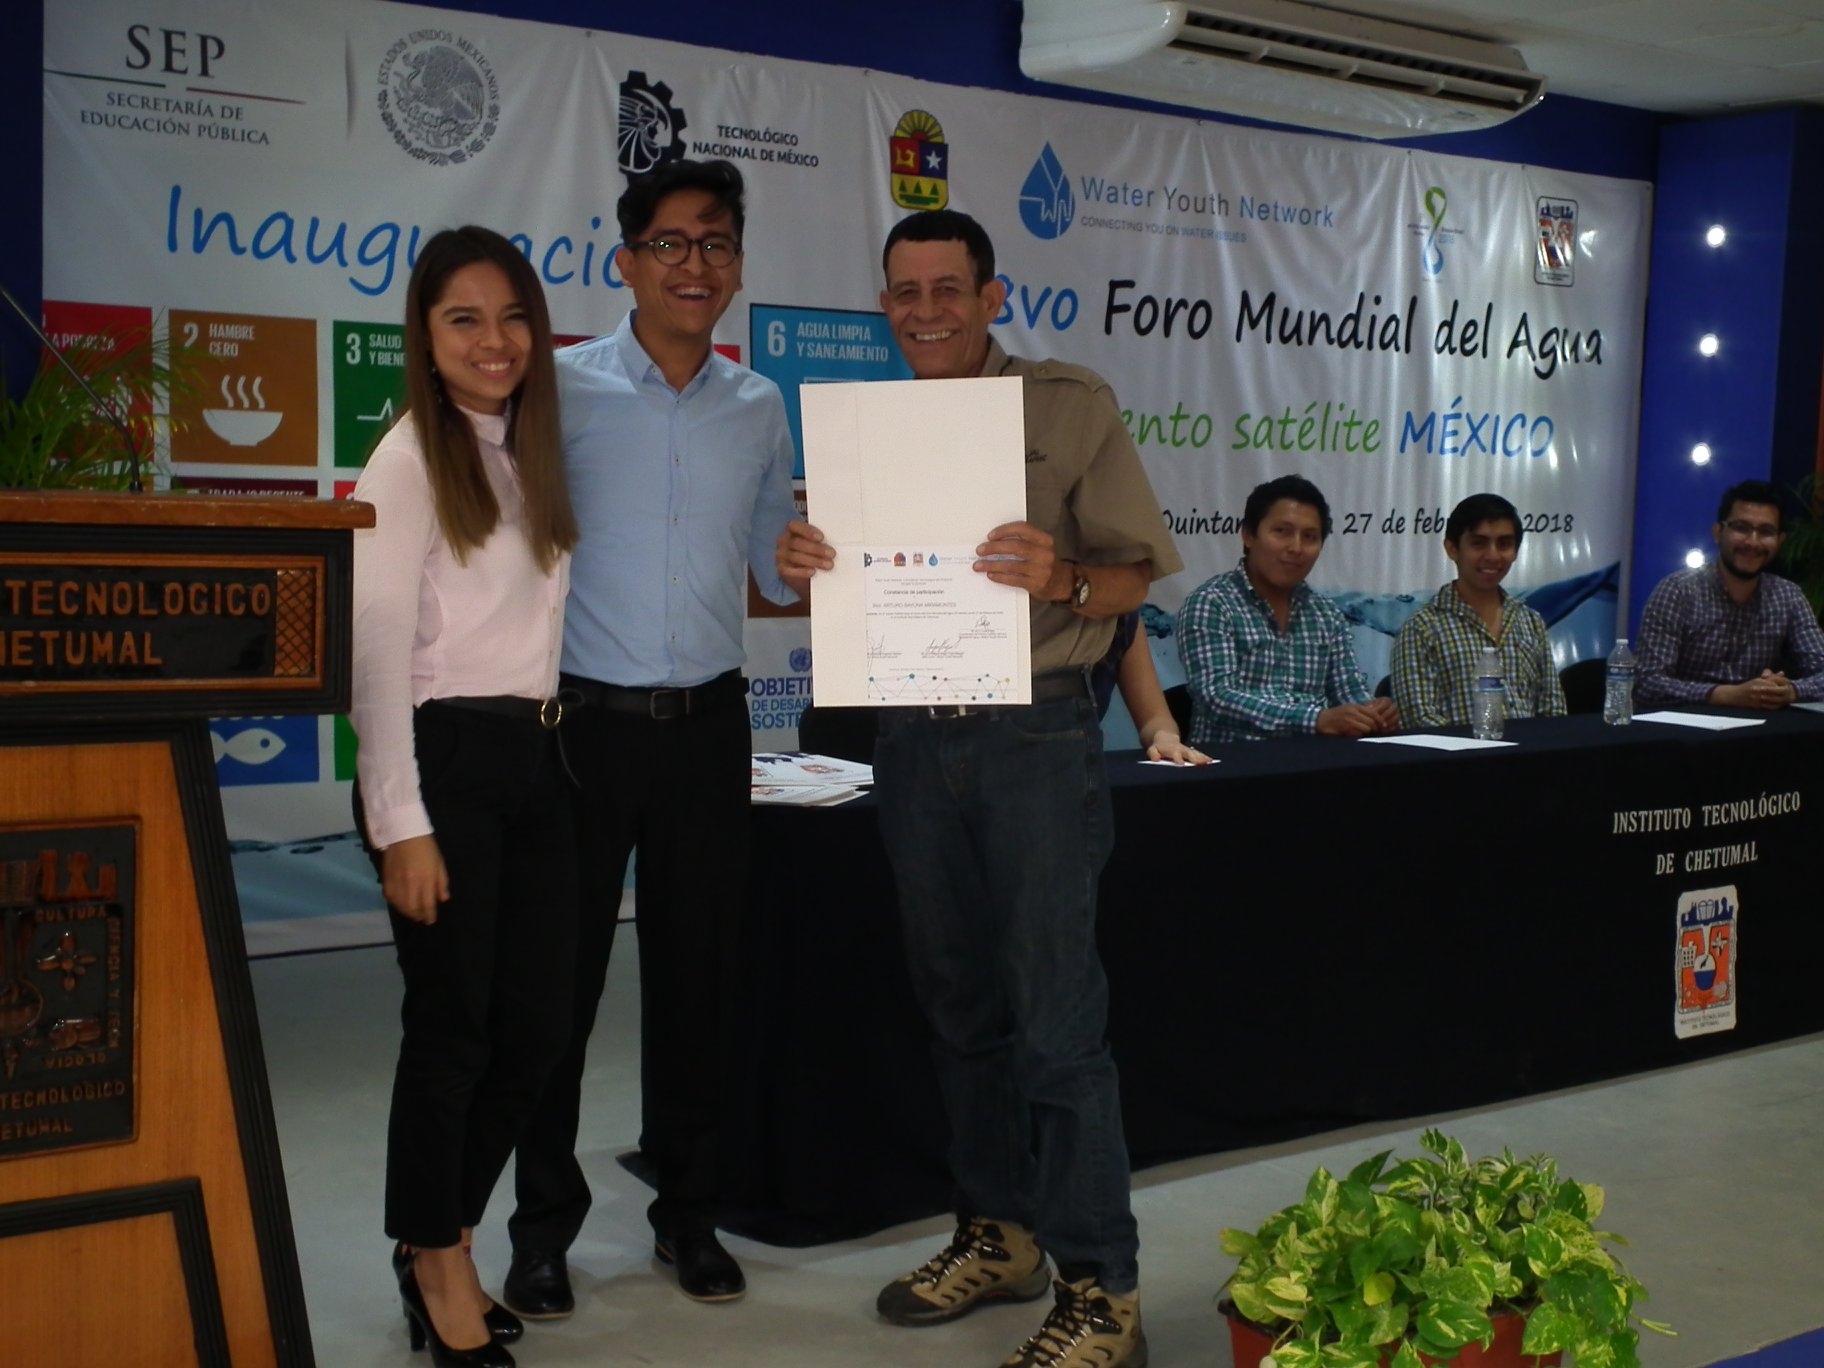 8VO FORO MUNDIAL DEL AGUA - Evento Satélito México Chetumal Q.Roo a 27 de febrero de 2018